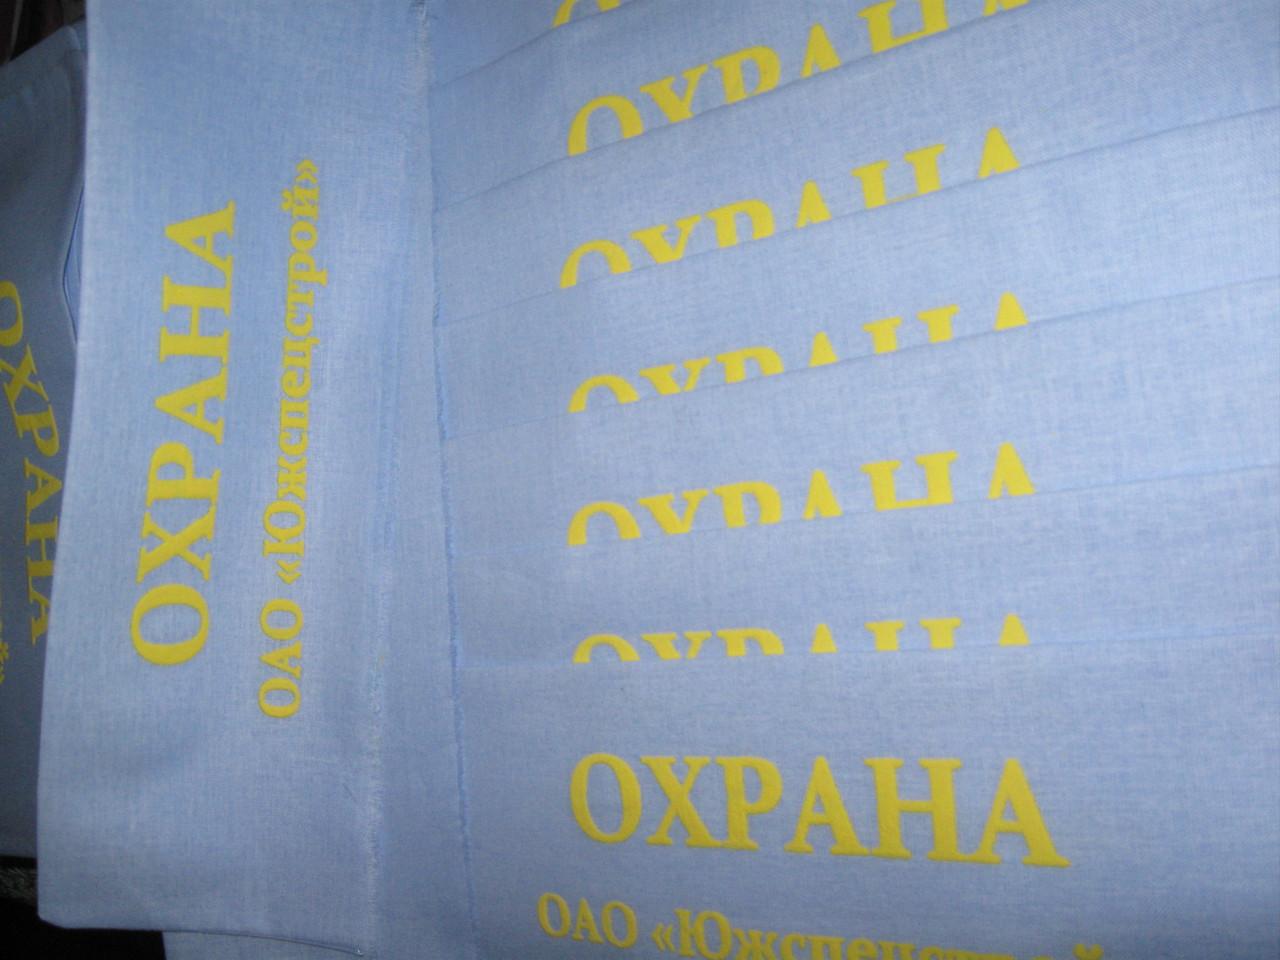 Шелкотрафаретная печать на ткани - Silver Star Print в Харькове